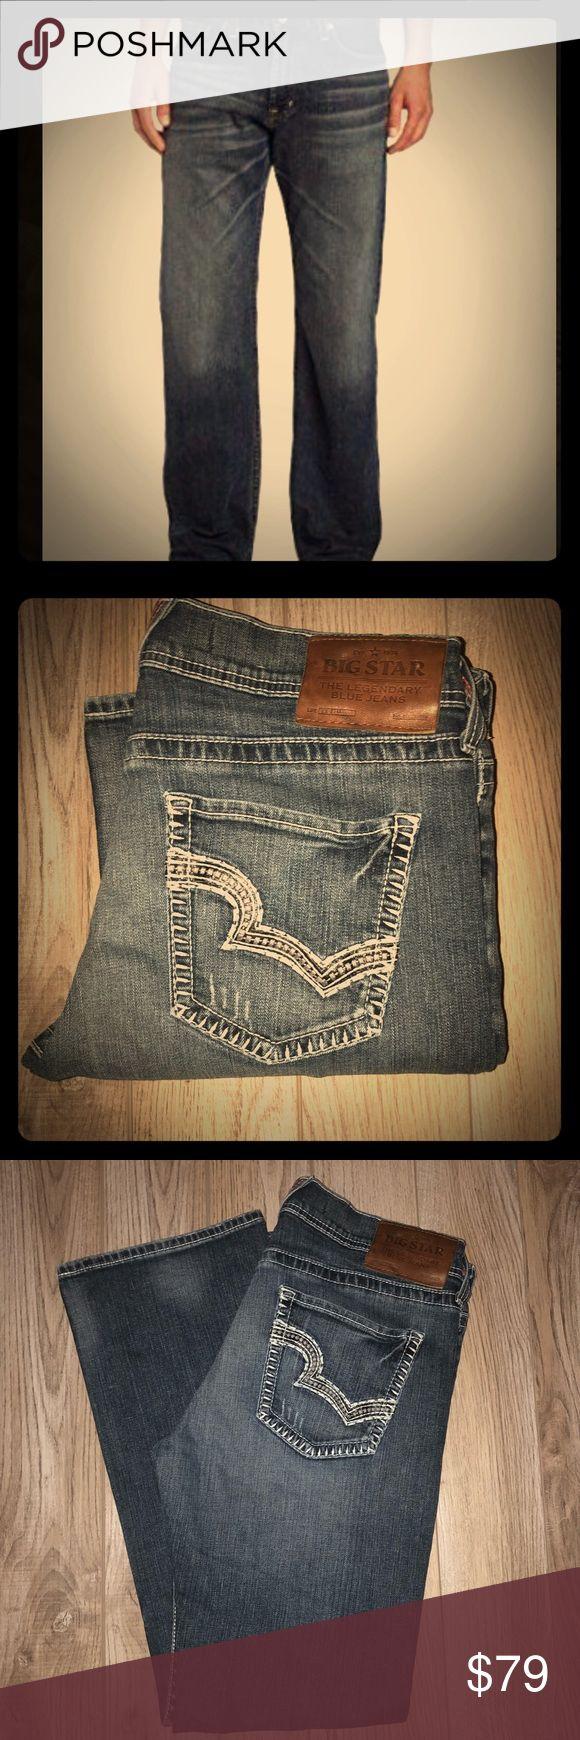 Men's Big Star Pioneer Boot 34R Like New ❤️ Like new men's Big Star Bootcut Pioneer jeans RN 75900 Big Star Jeans Bootcut #mensjeansbootcut